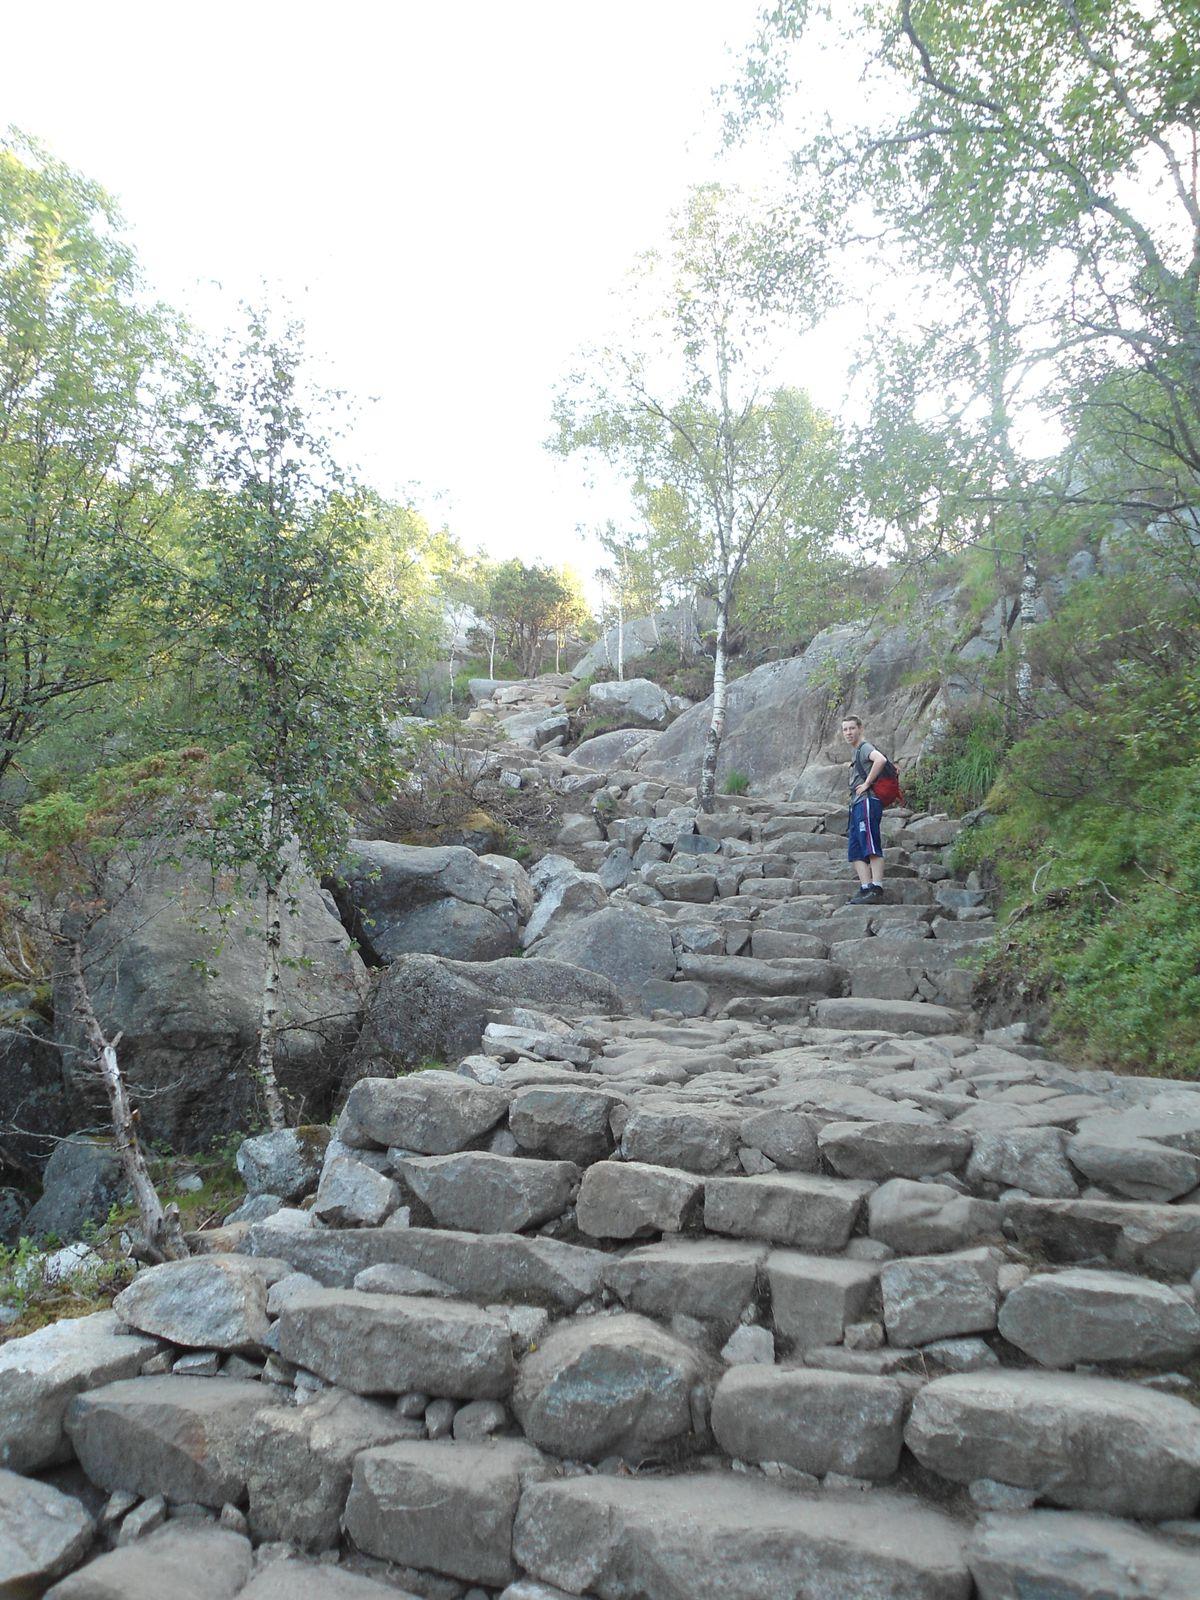 Jour 22 Stavanger -> Sandnes -> Jorpeland (63.7 km)